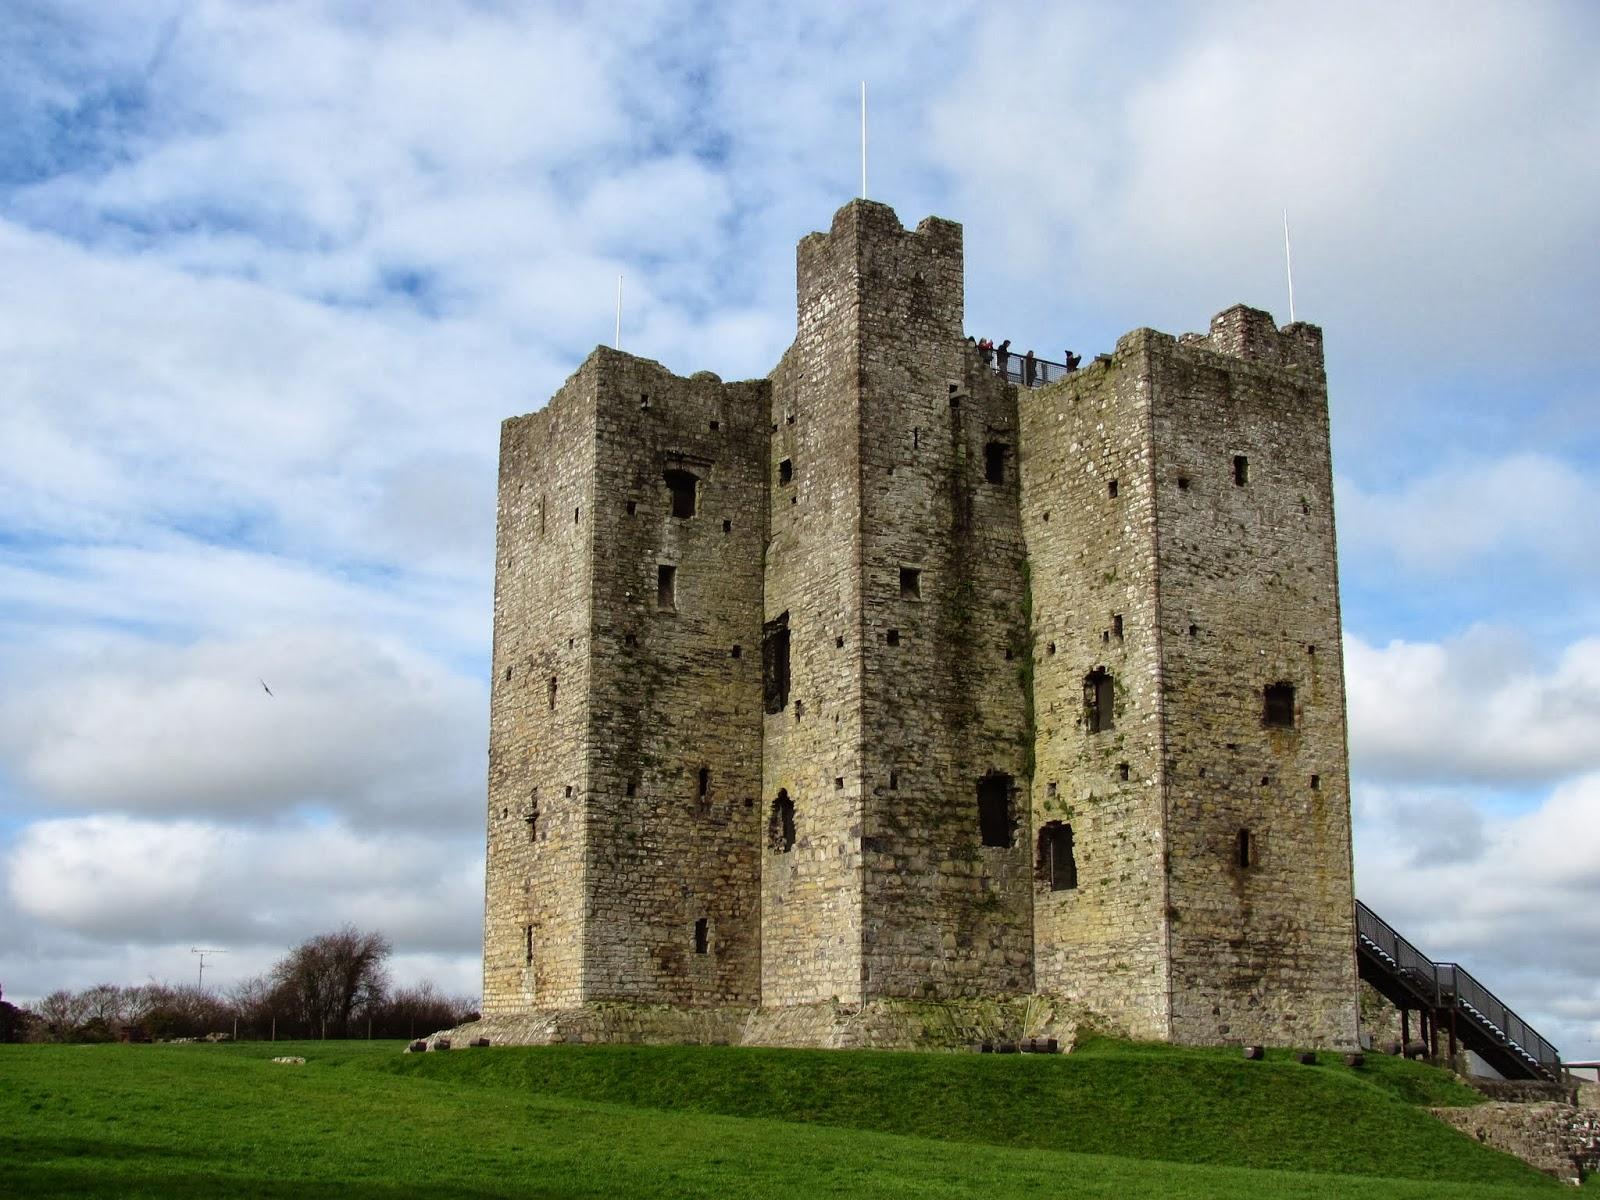 The keep of Trim Castle in Trim, Ireland